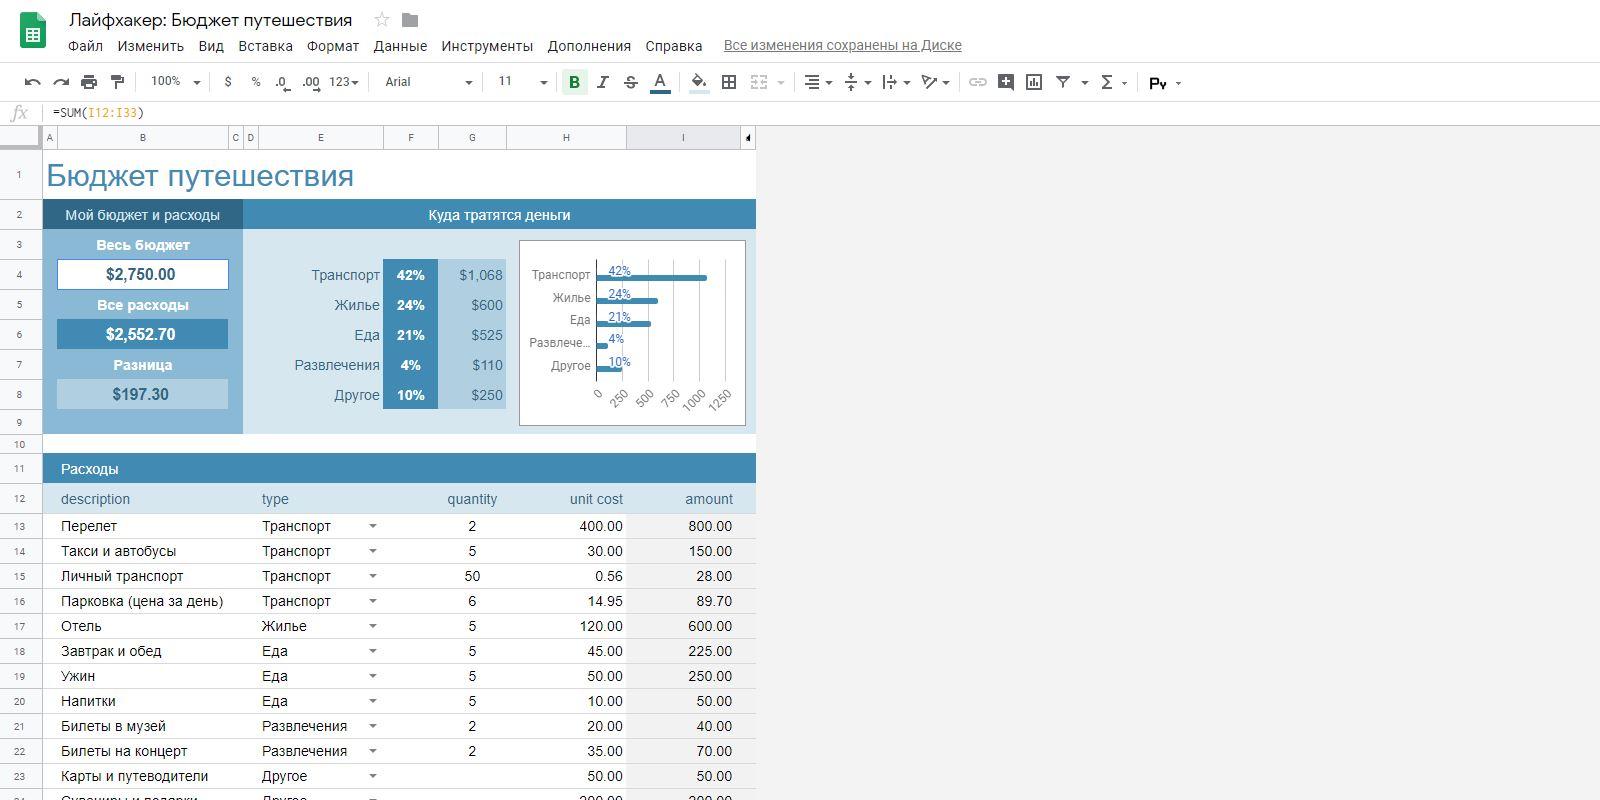 «Google Таблицы»: шаблон «Бюджет путешествия»